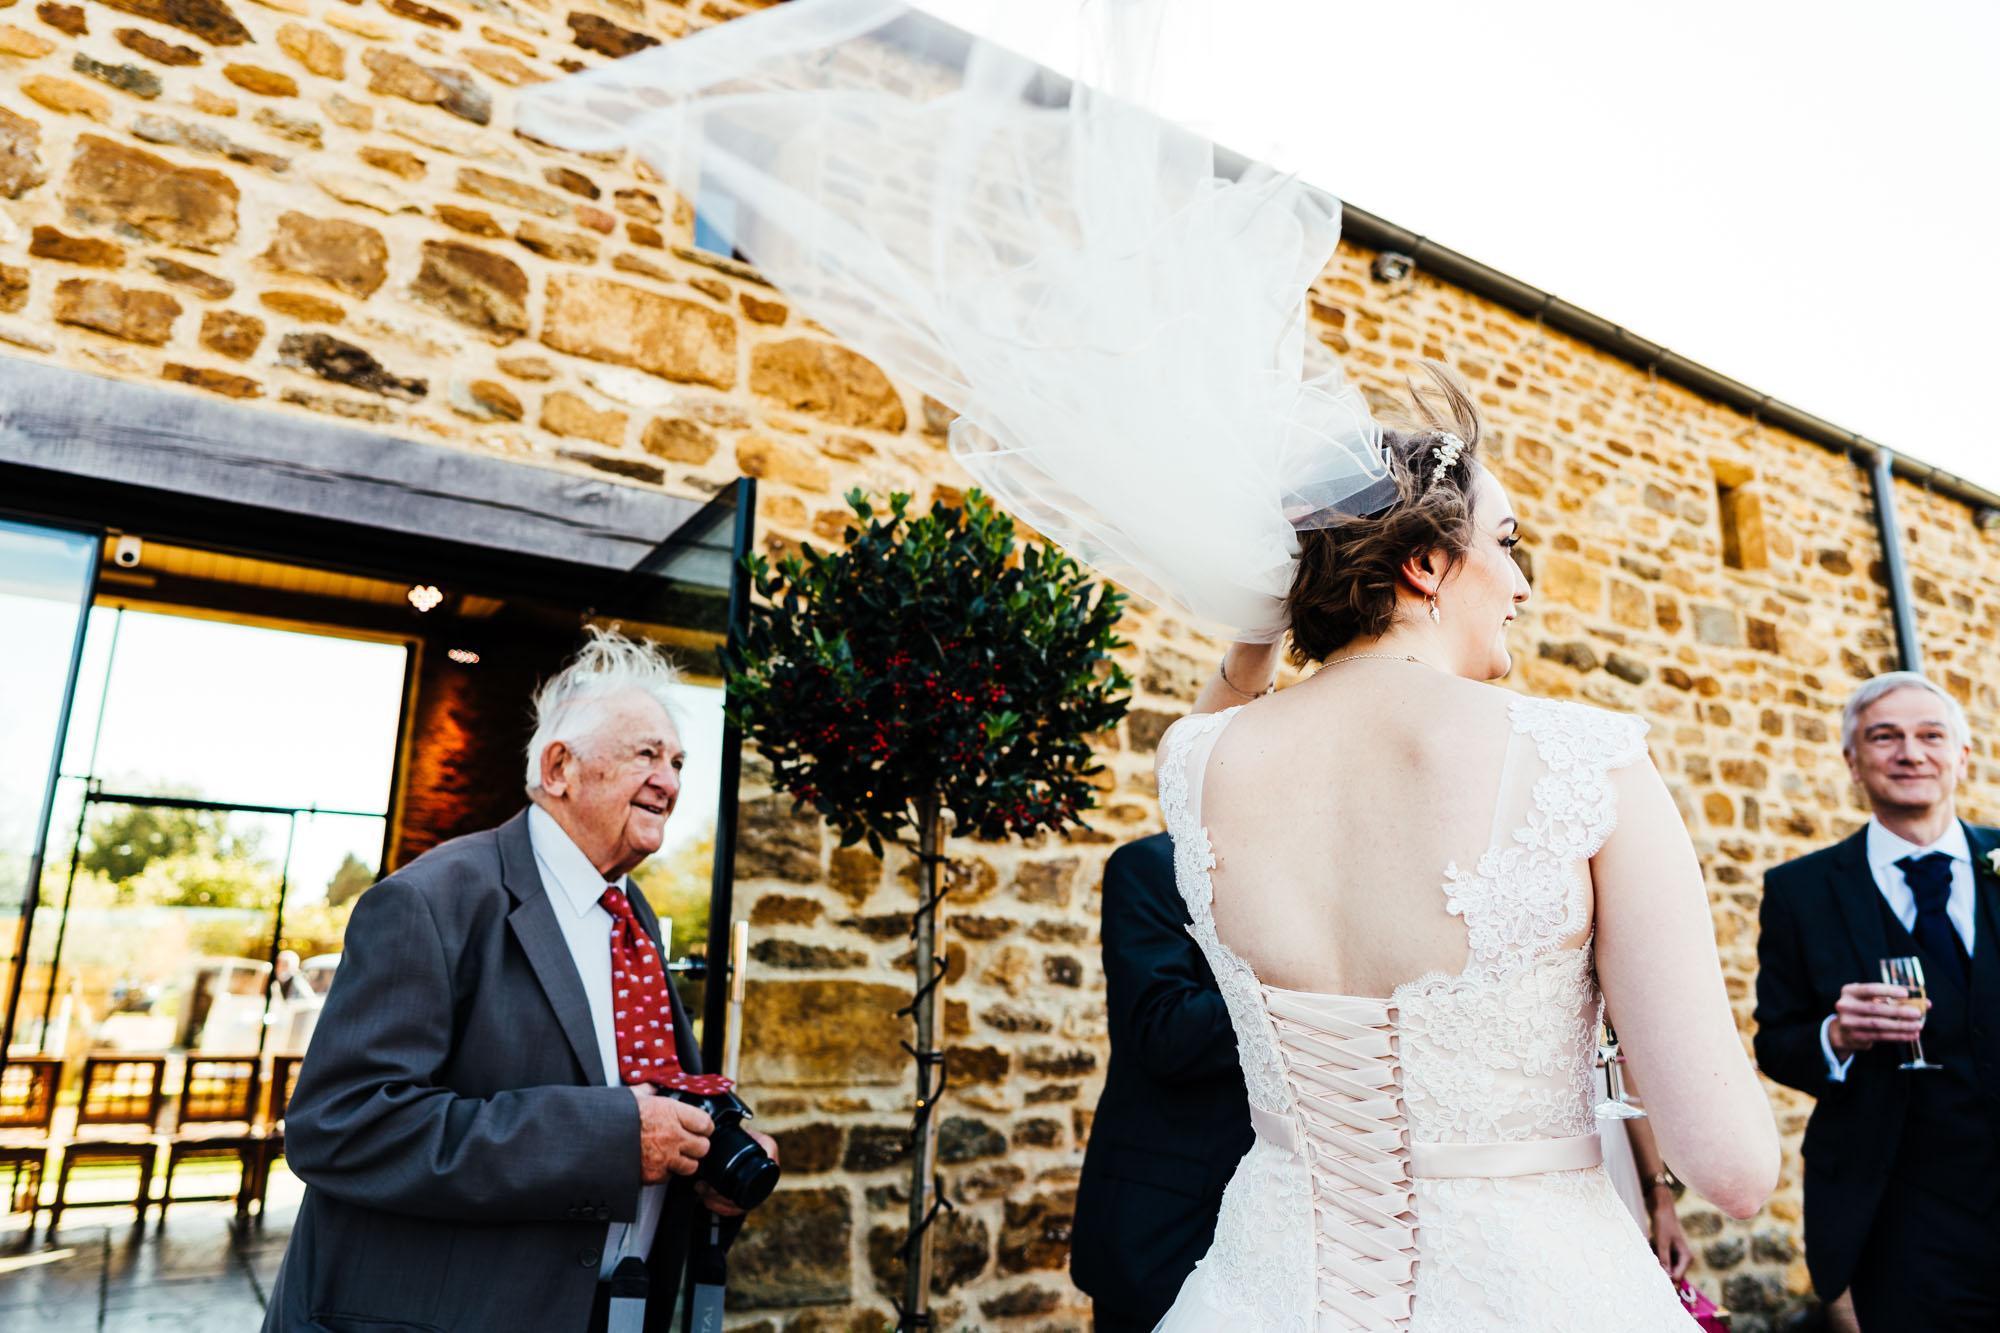 wedding-at-dodford-manor-46